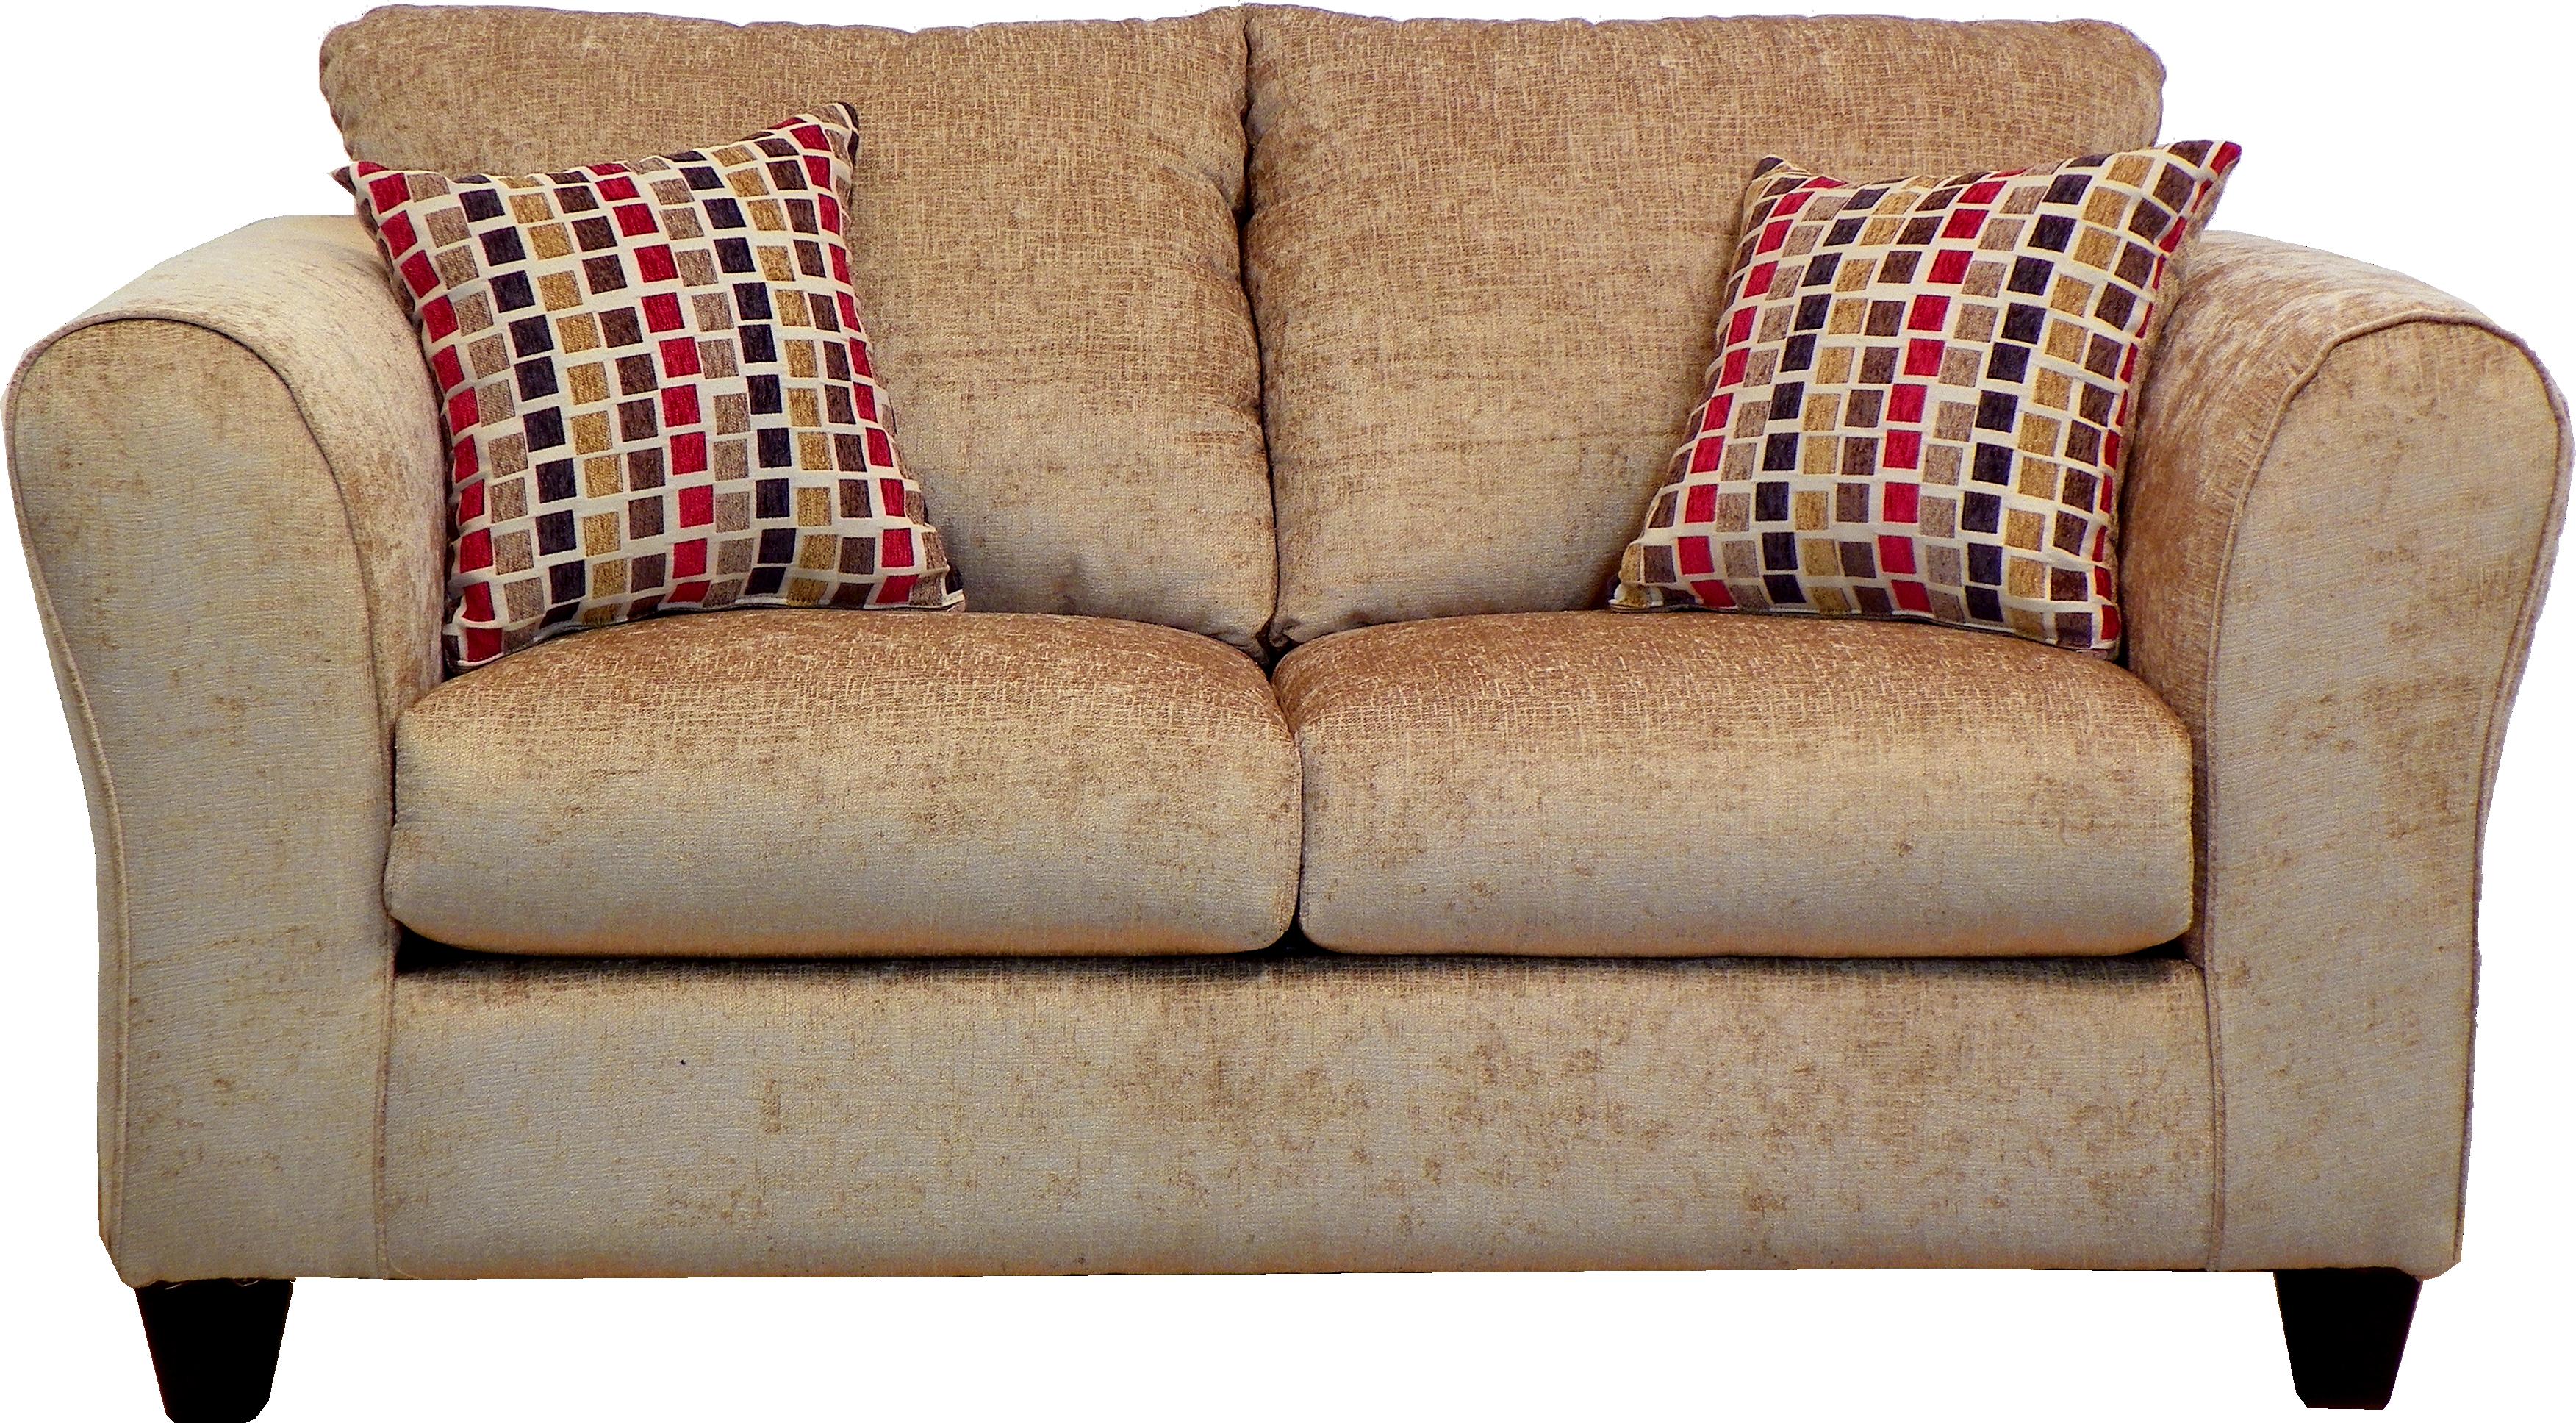 Sofa PNG image - Sofa HD PNG